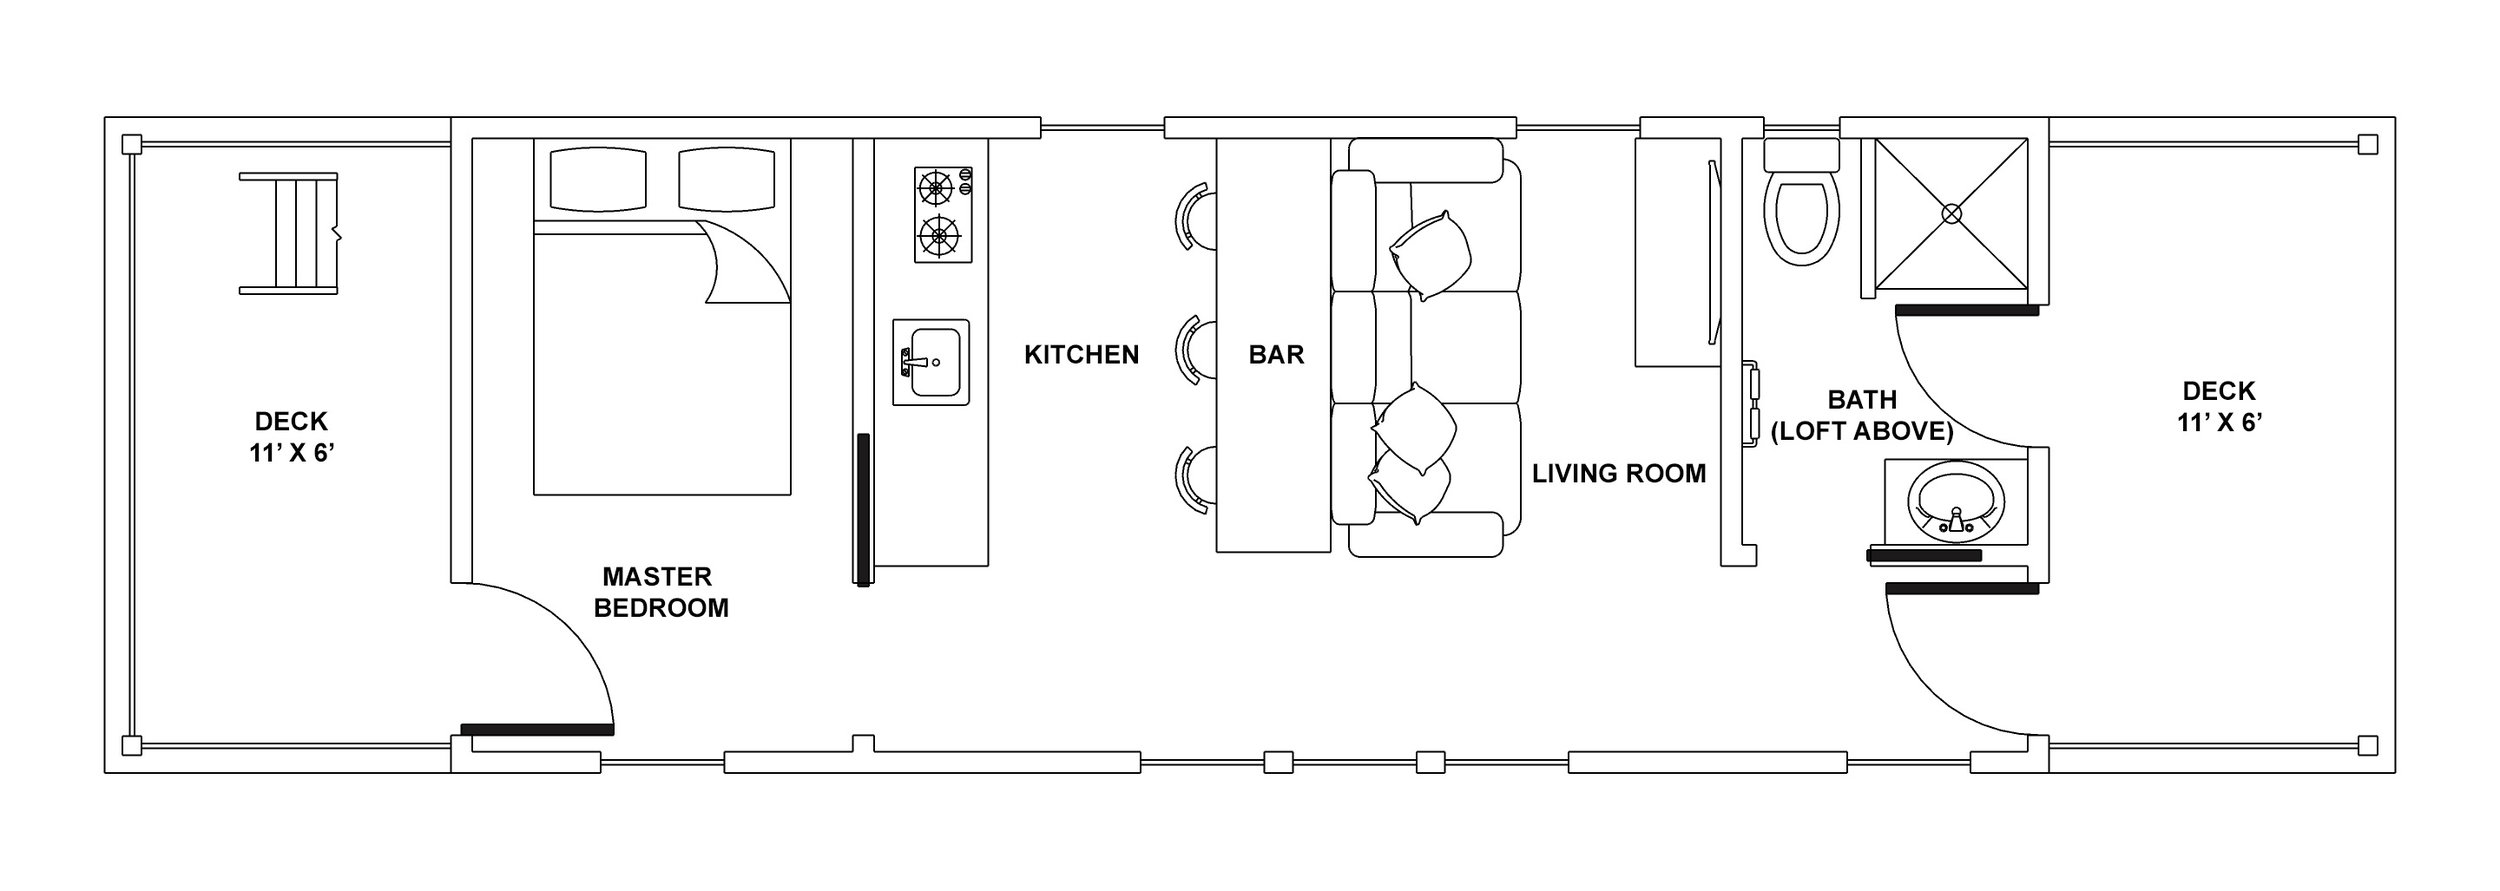 The Nautilus Floor Plan (Labeled).jpg